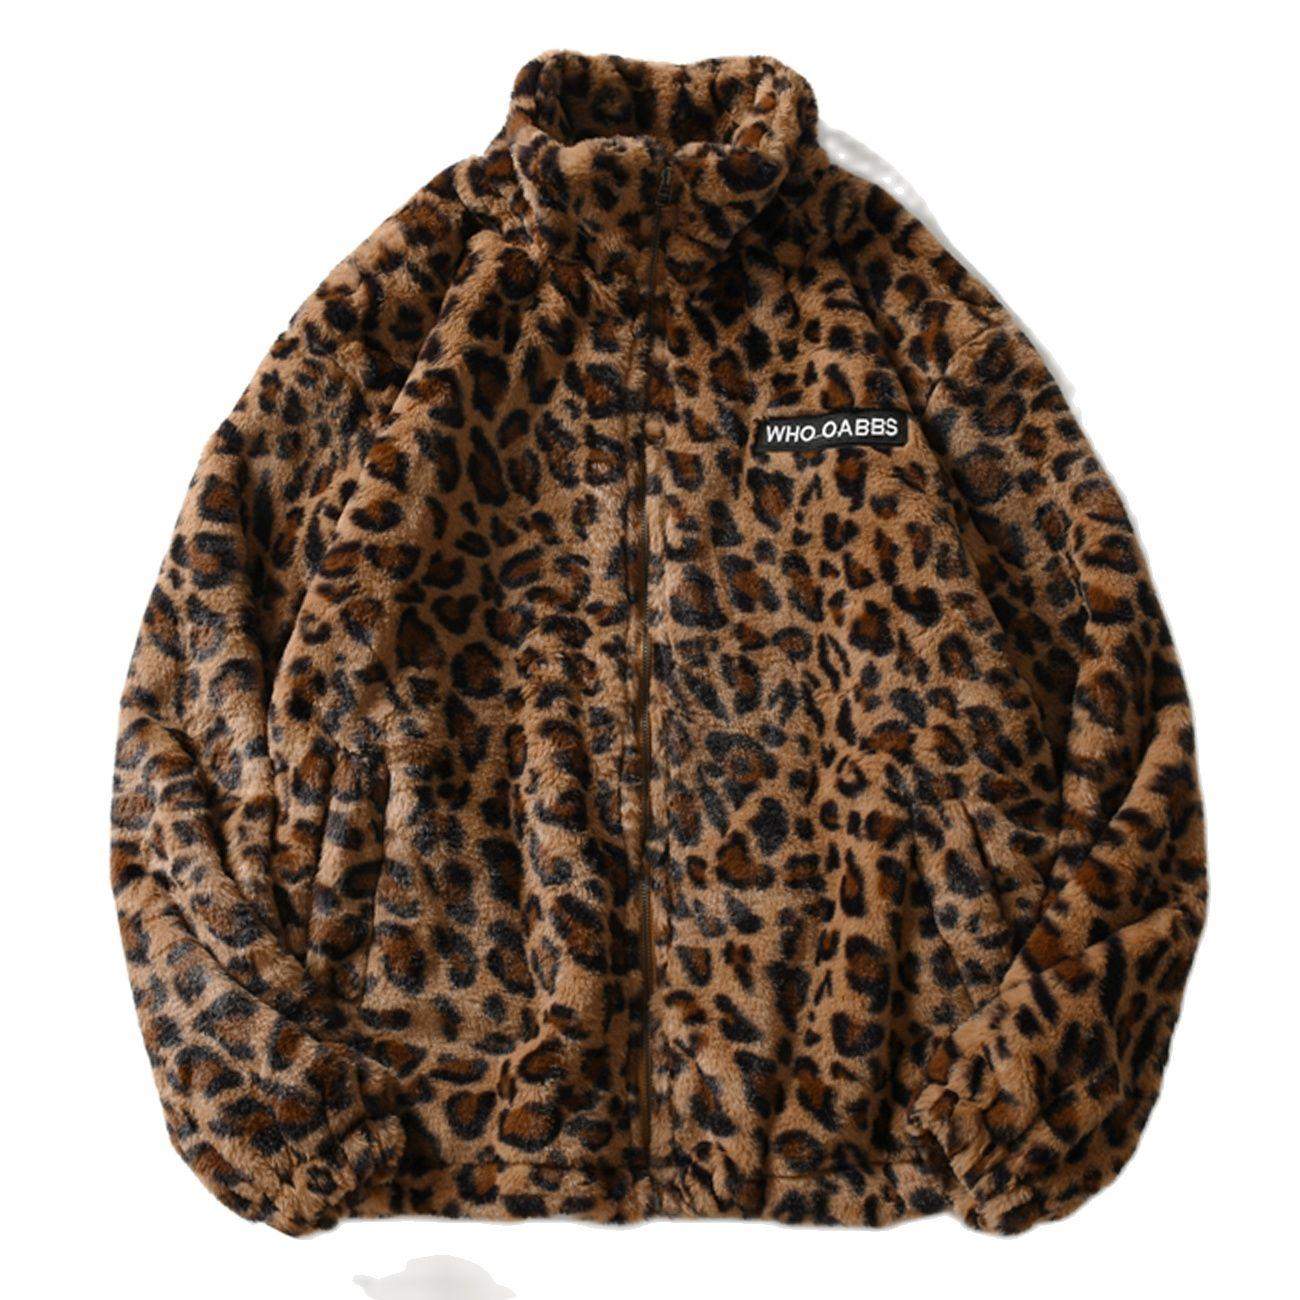 Hip Hop Lambswool Sherpa Jacket Mens Streetwear Leopard Pattern Stand Cardigan Coats Winter Harajuku Loose Couple Coats Outwear